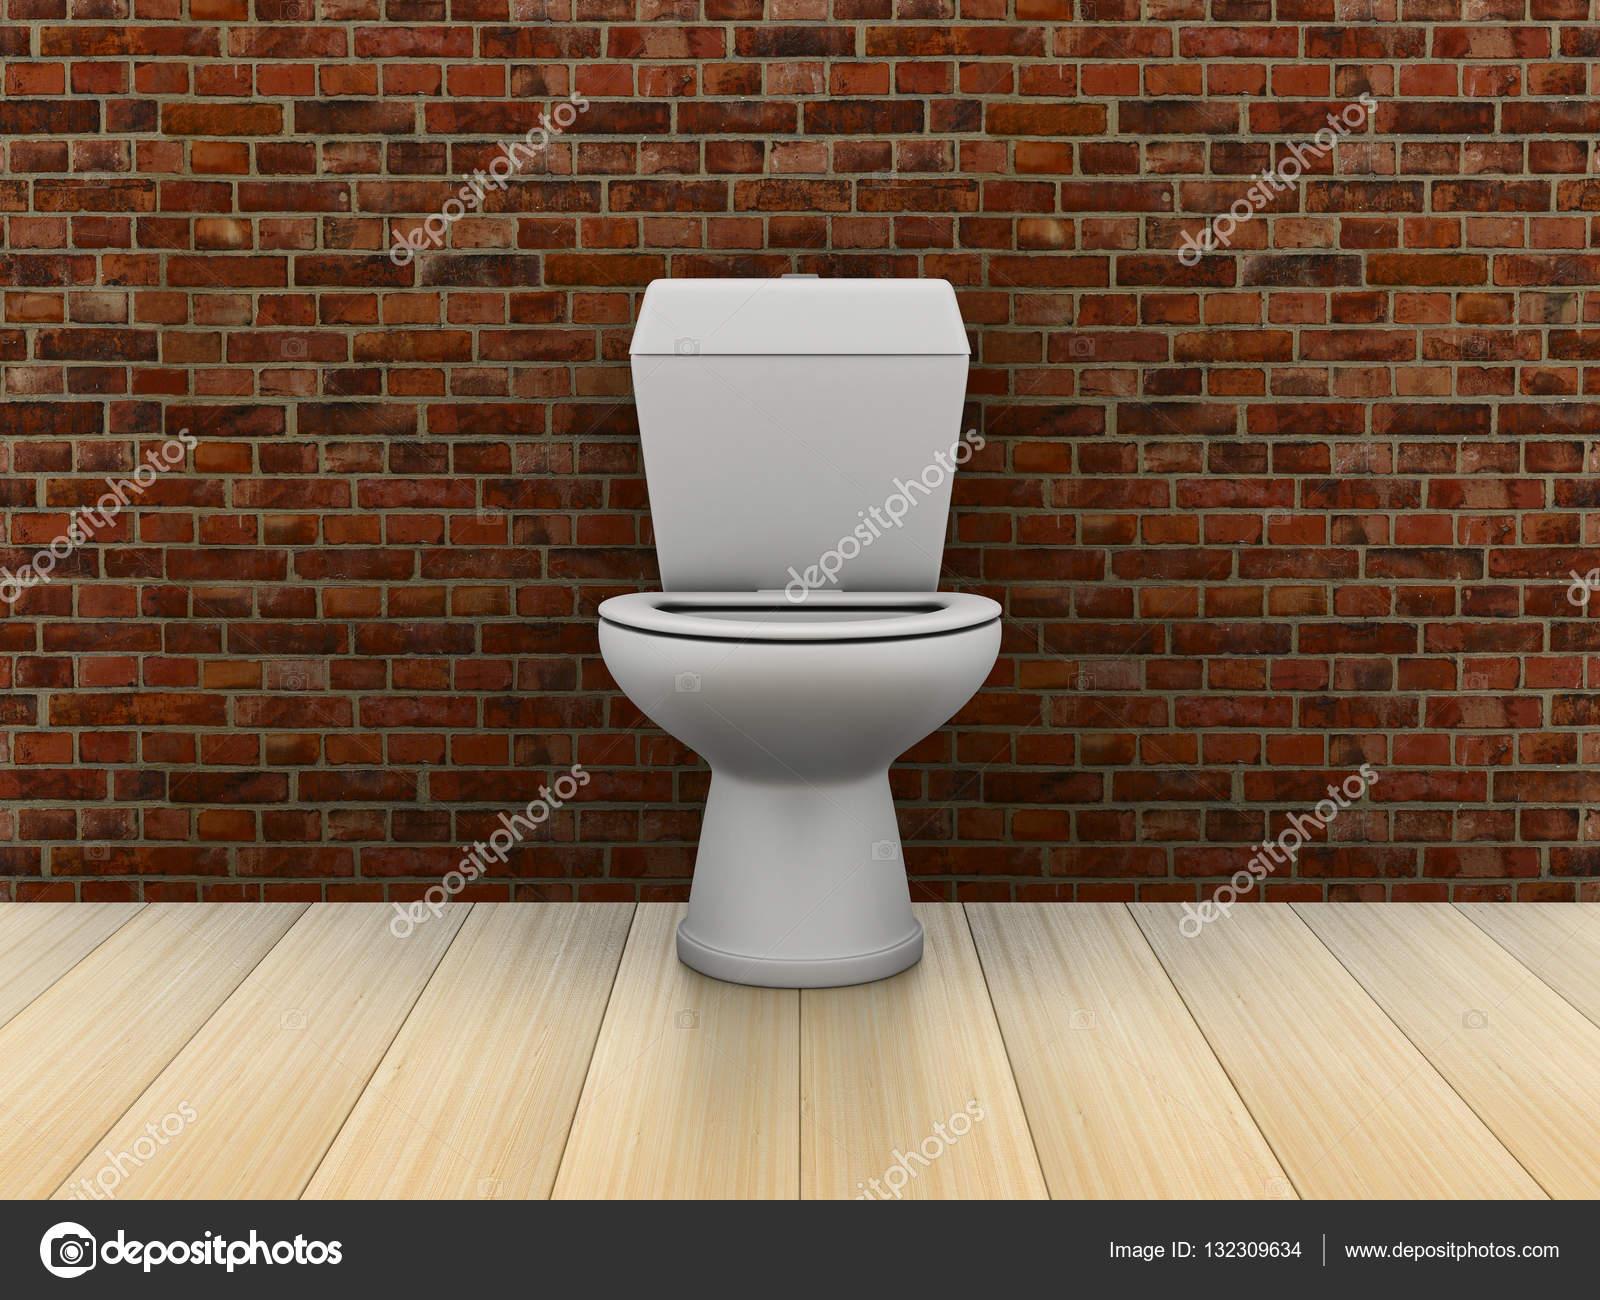 Kamer met water closet. 3d afbeelding u2014 stockfoto © isergey #132309634